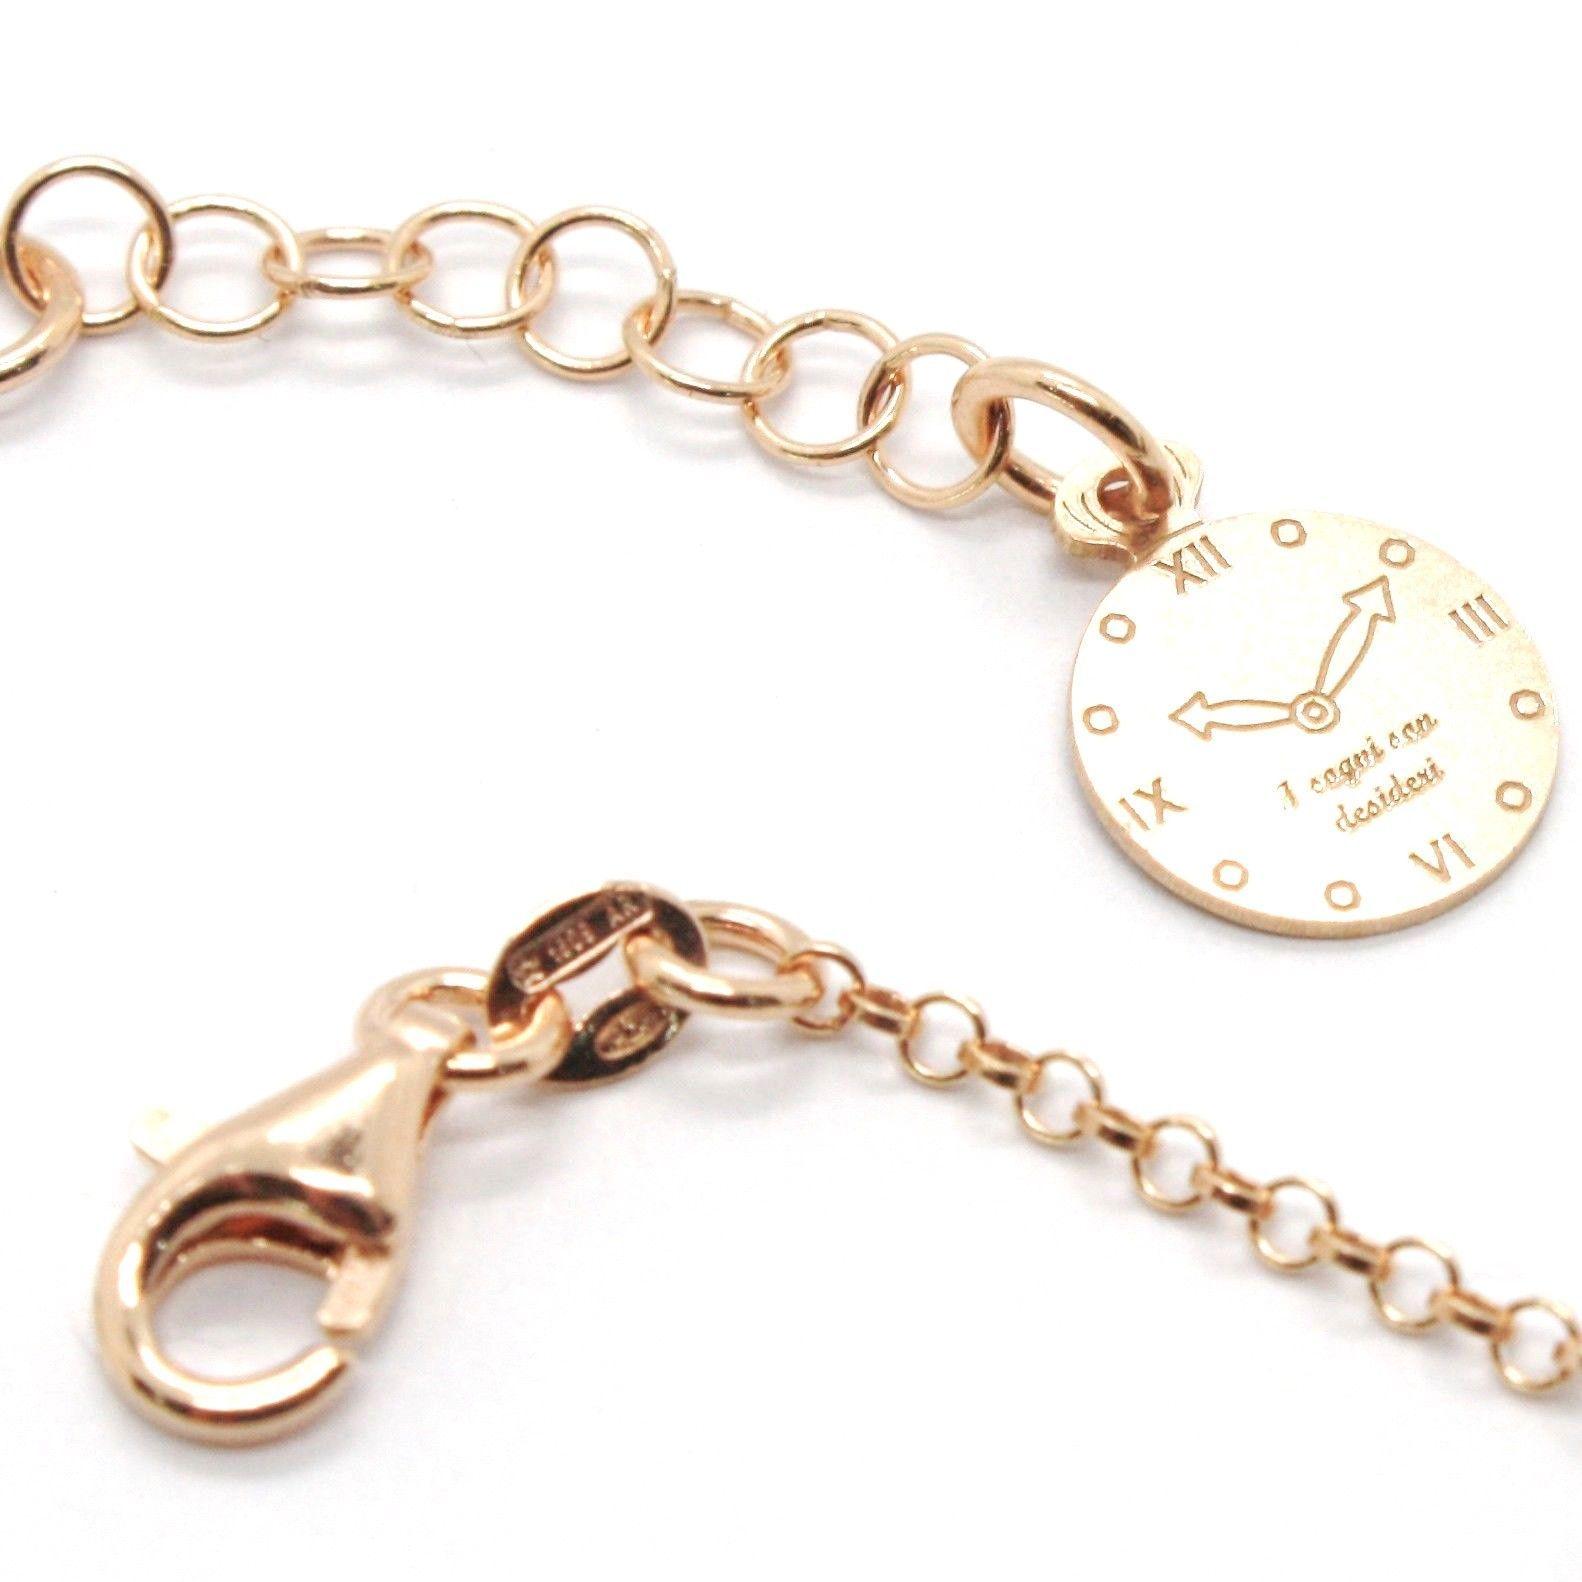 Bracelet en Argent 925 Stratifié en or Rose les Fées avec Noeud AG-901-BR-52